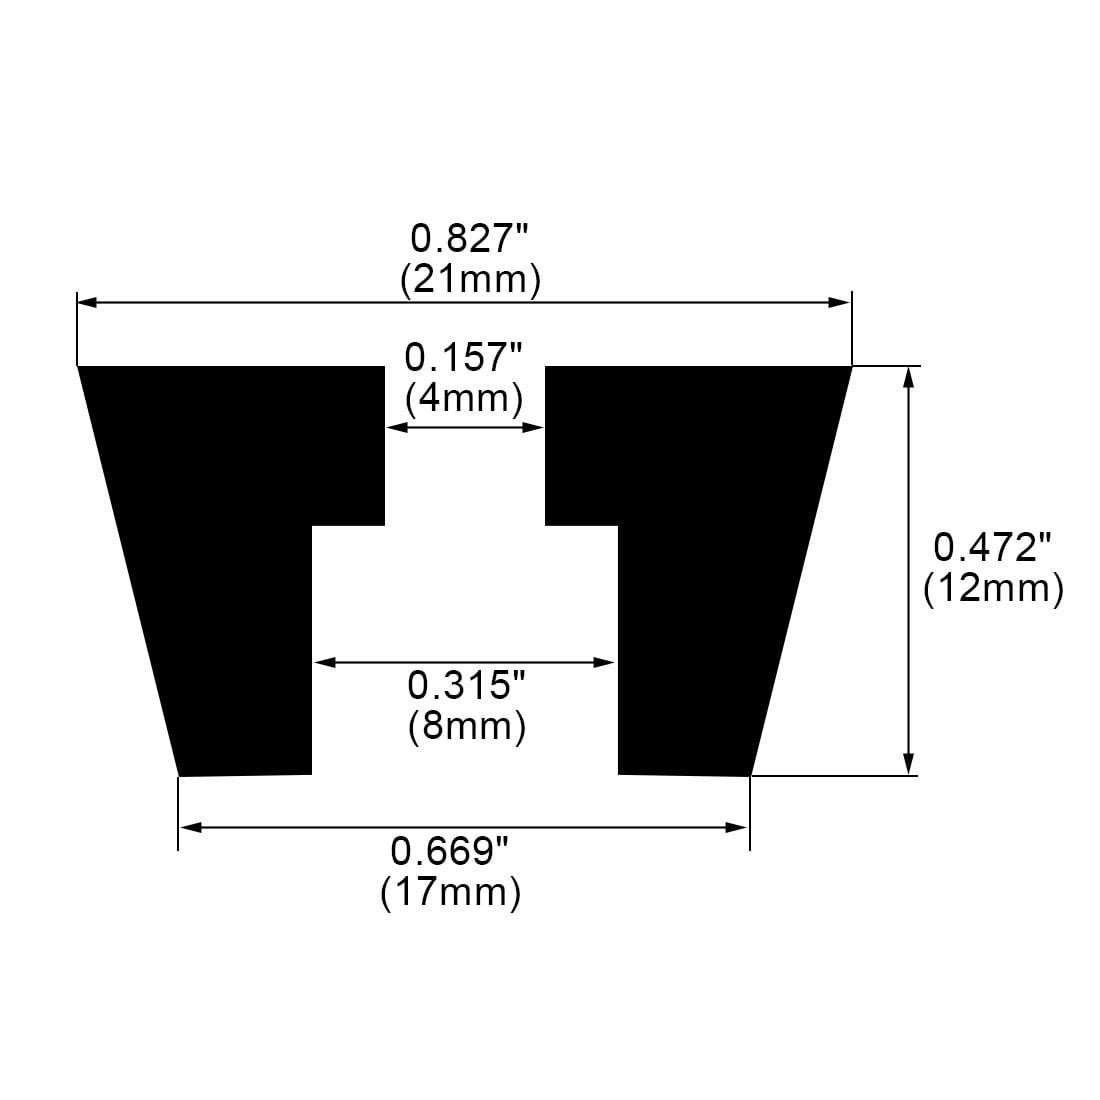 55pcs Rubber Feet Bumper Cabinet Amplifier Speaker Desk Leg Pads, D21x17xH12mm - image 4 de 7